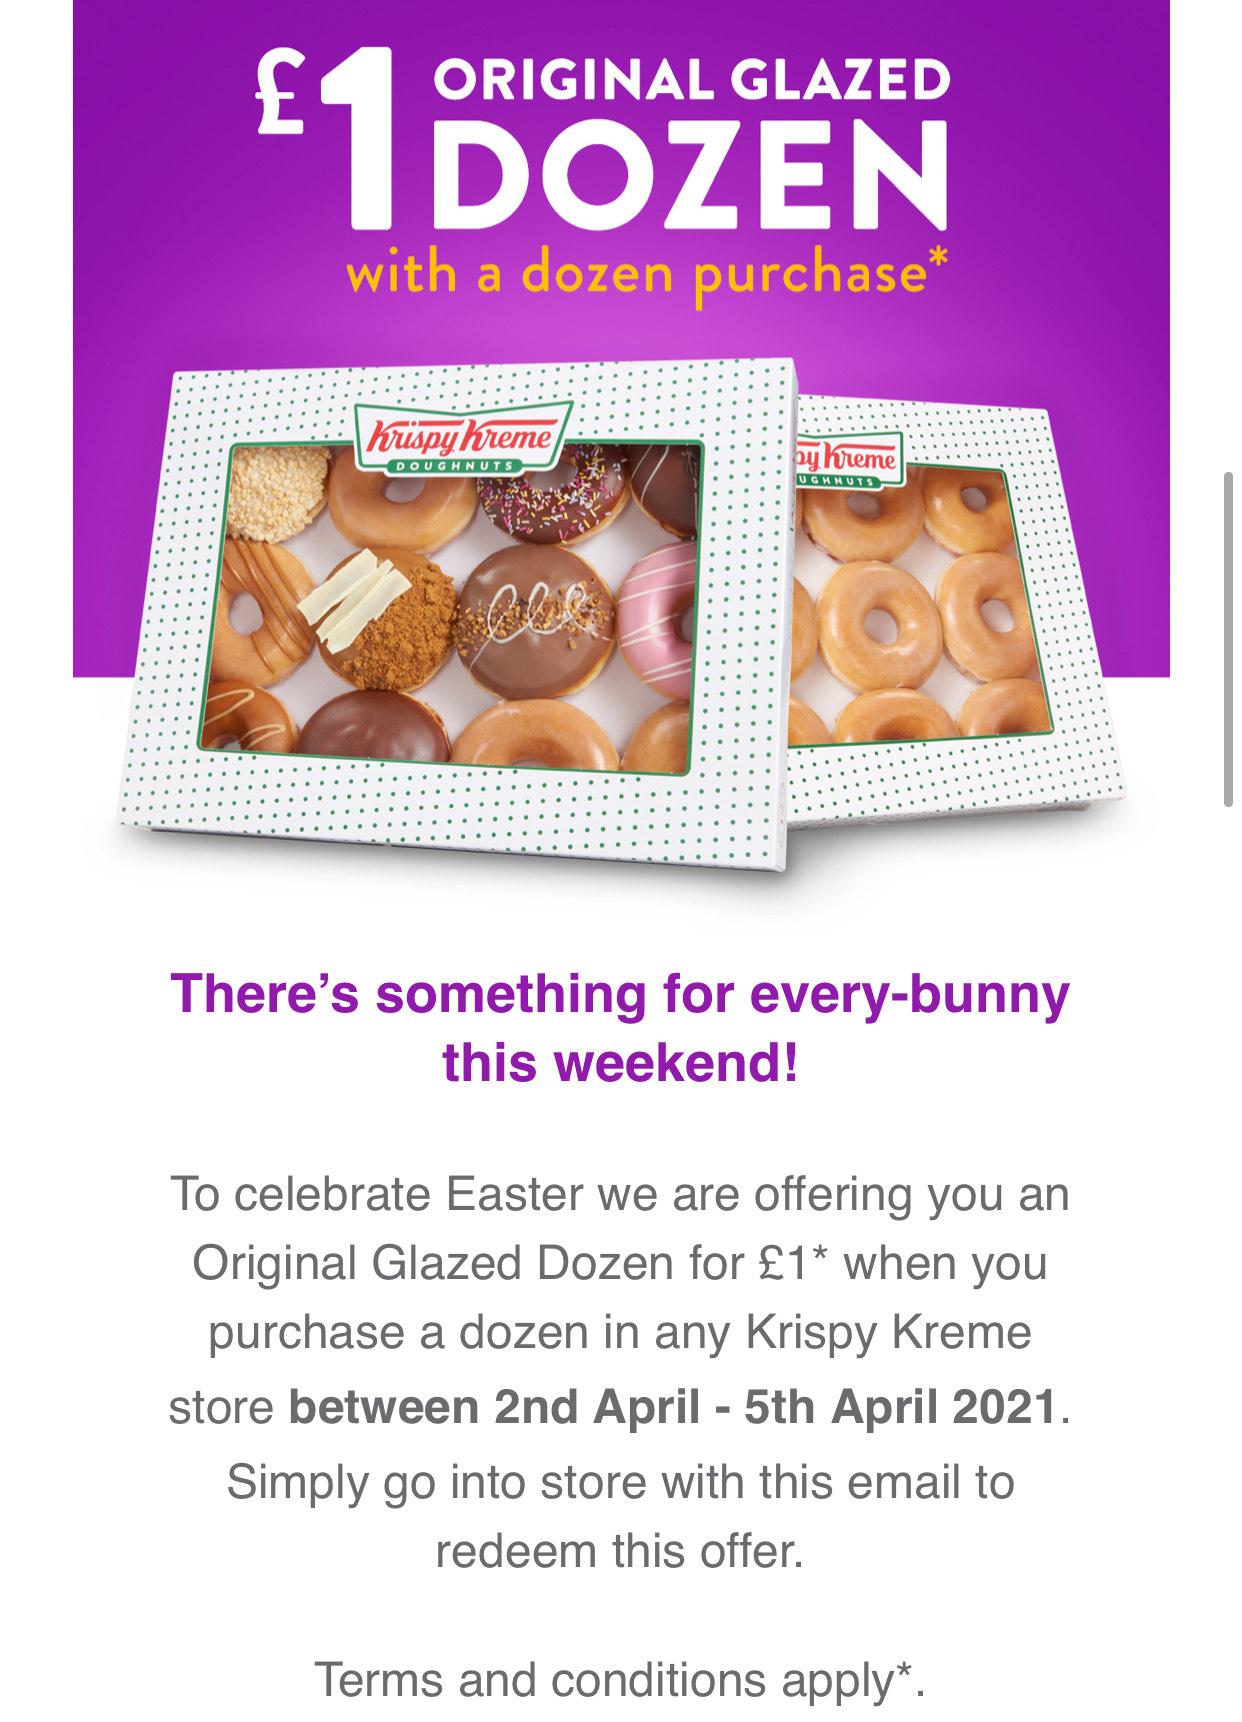 £13.95 Krispy Kreme buy a dozen doughnuts and get original glazed dozen for £1